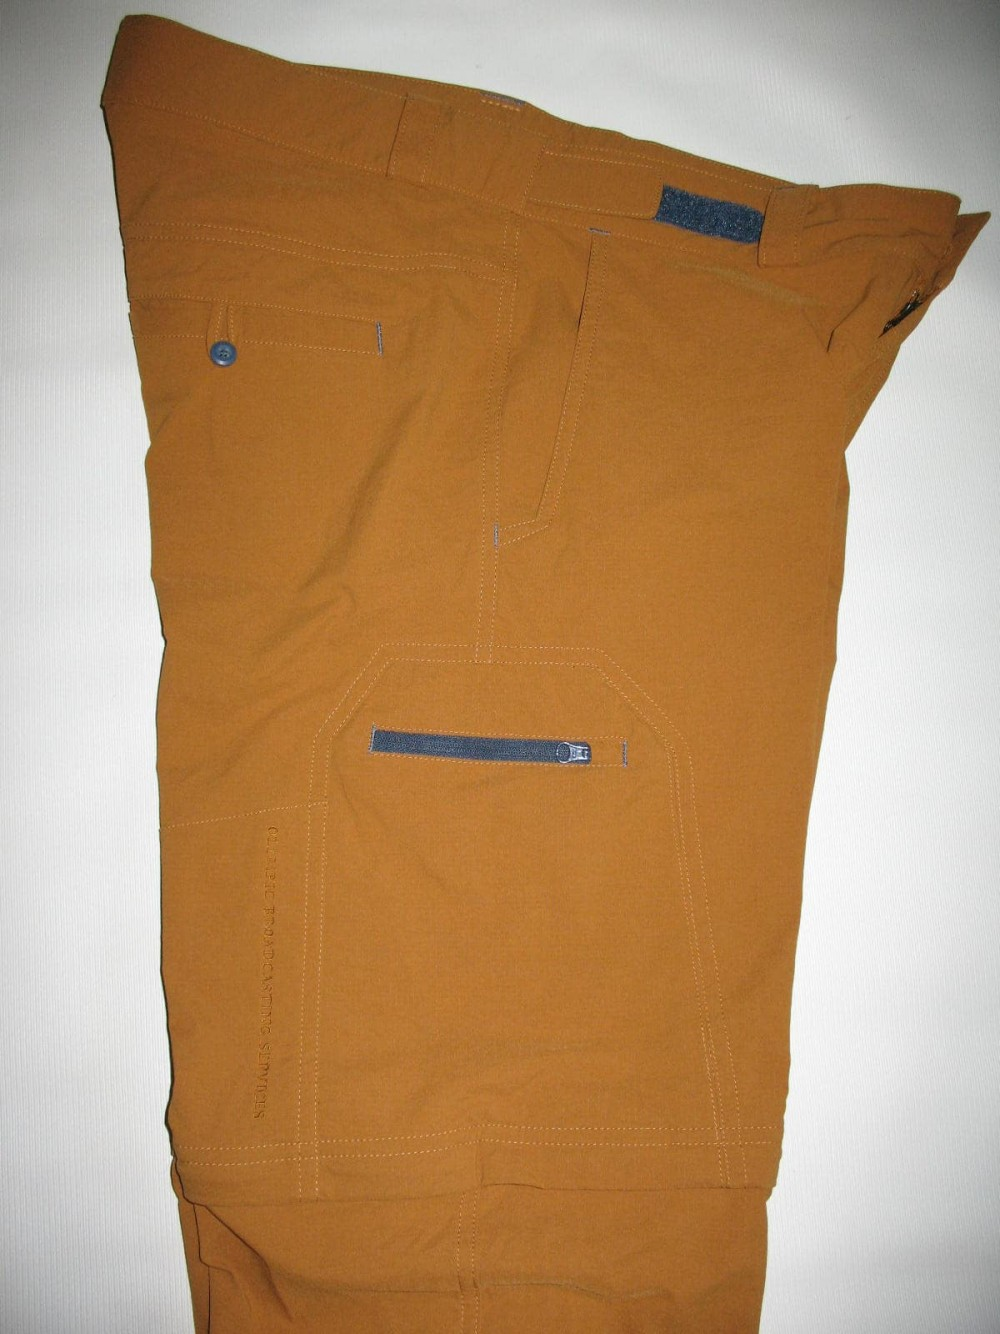 Штаны HELLY HANSEN obs olimpic 2in1 pants (размер M) - 6